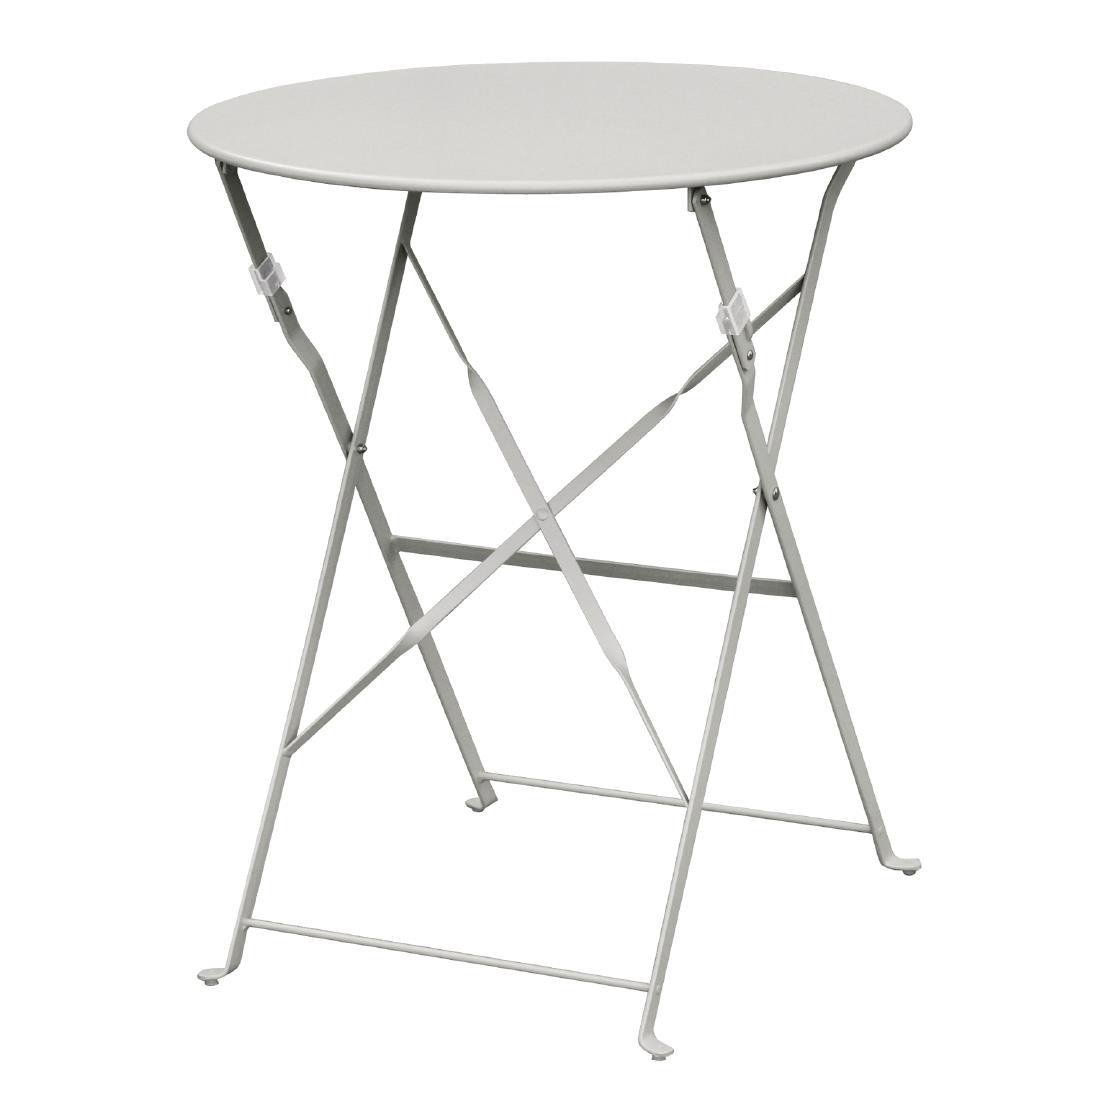 Steel Folding Table Round - Grey